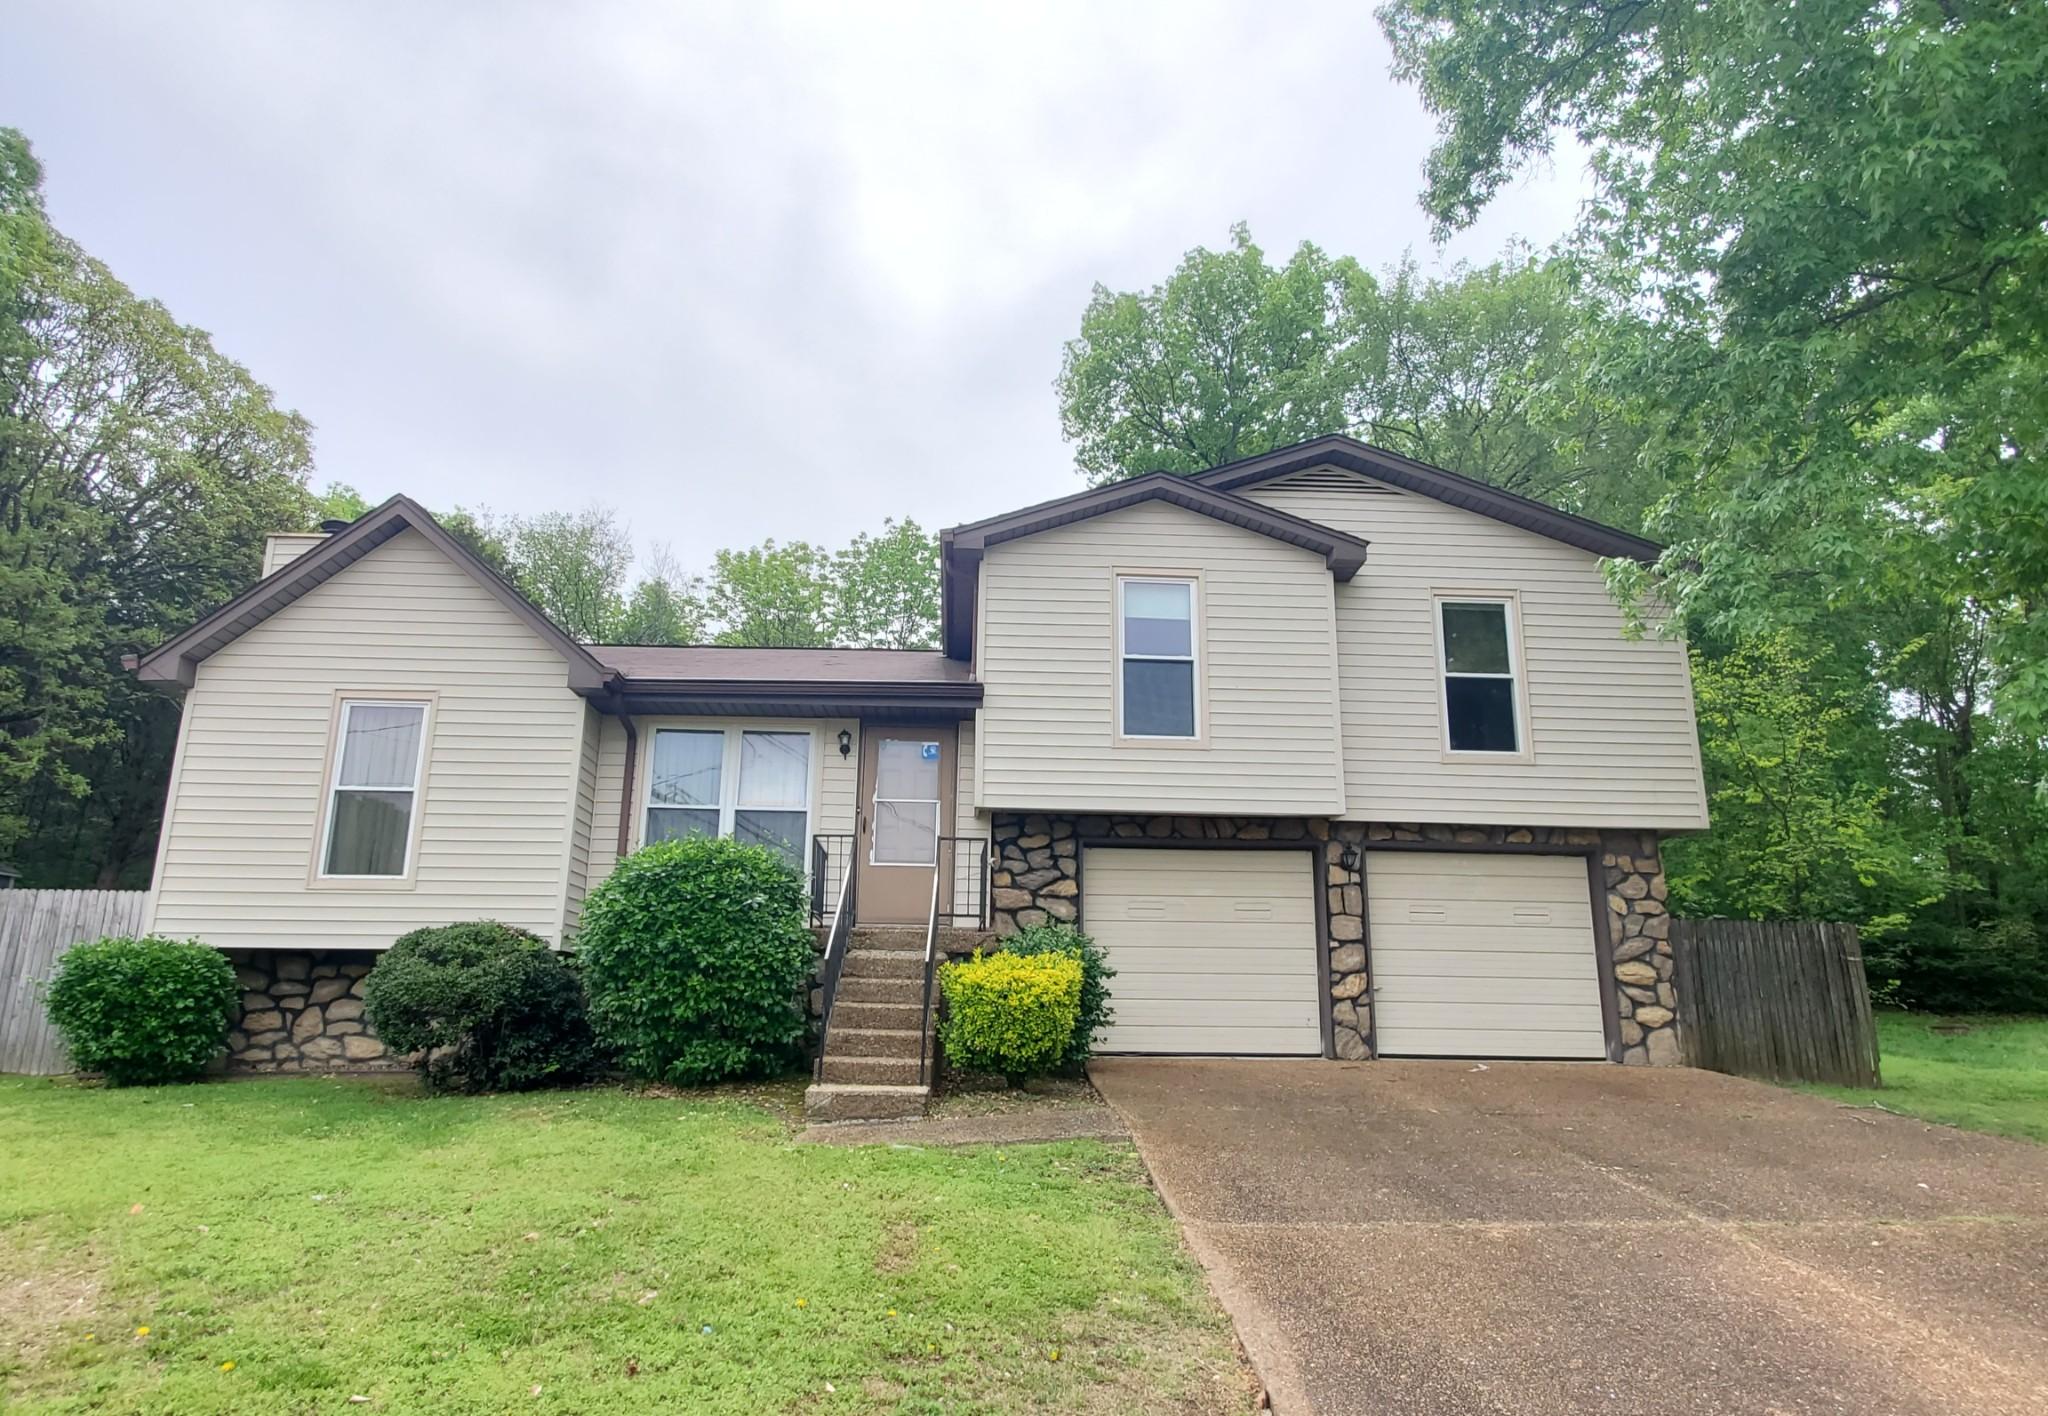 213 Fieldstone Ct, Nashville-Antioch in Davidson County, TN County, TN 37013 Home for Sale